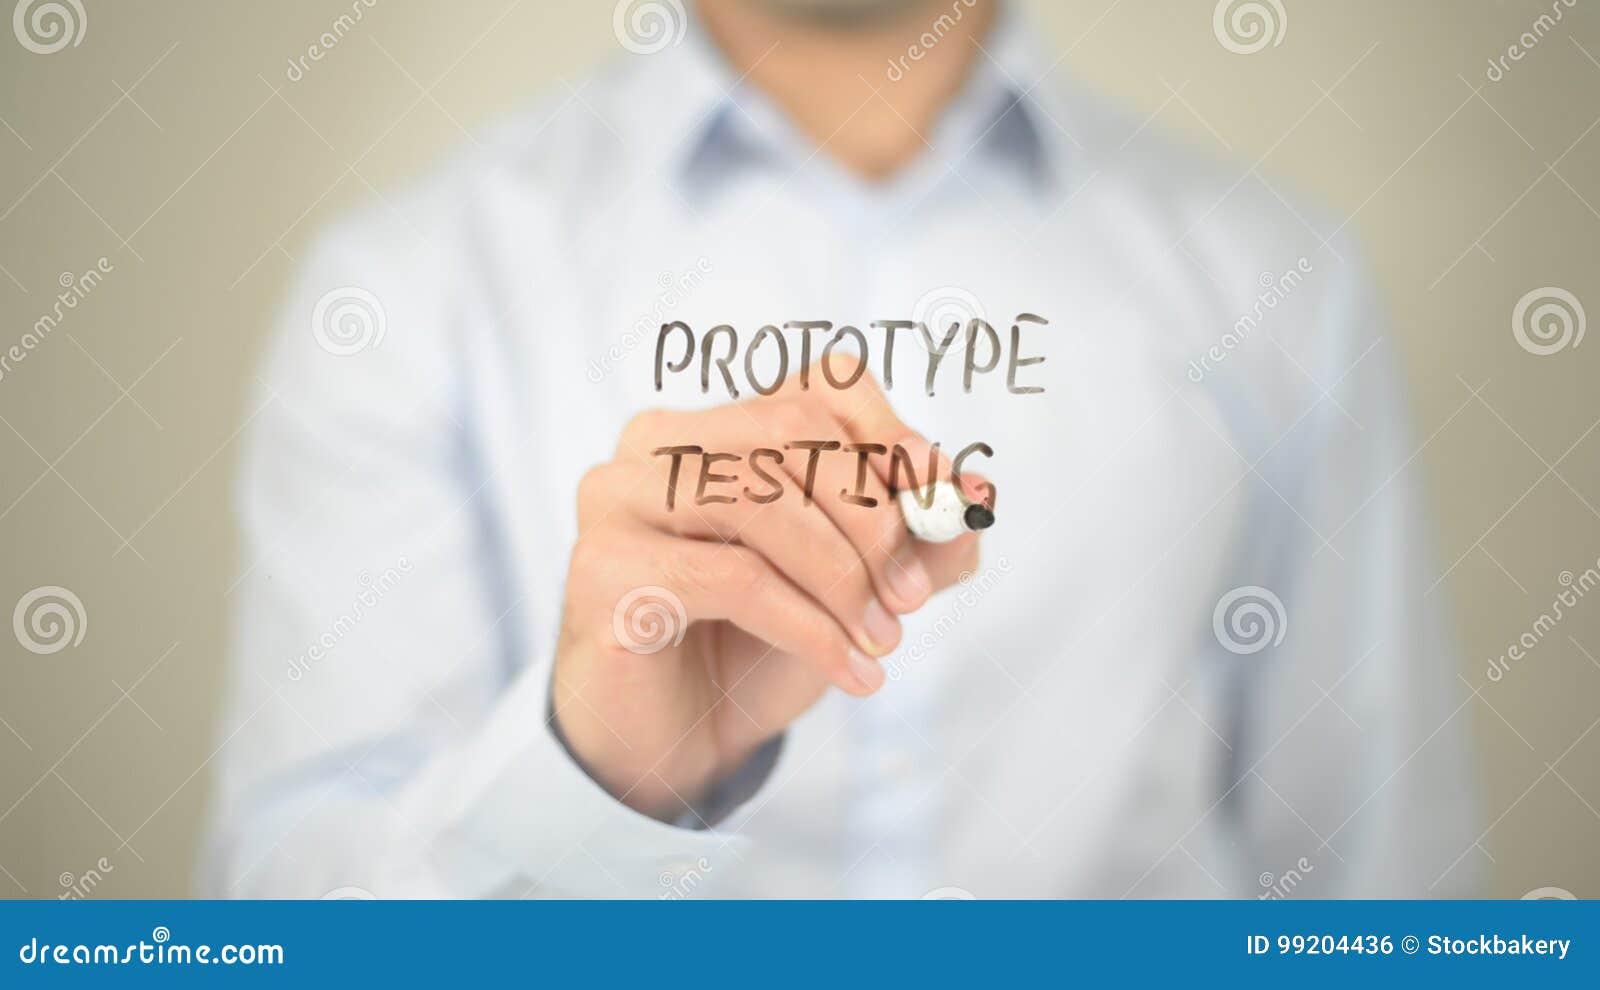 Protype Testing , Man writing on transparent screen